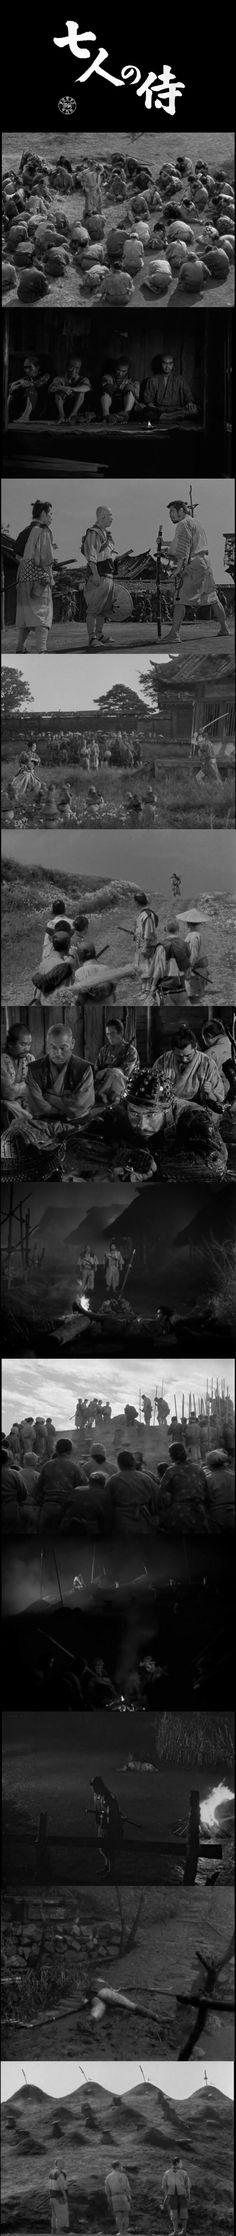 Seven Samurai (1954) -  Cinematography by Asakazu Nakai   Directed by Akira Kurosawa